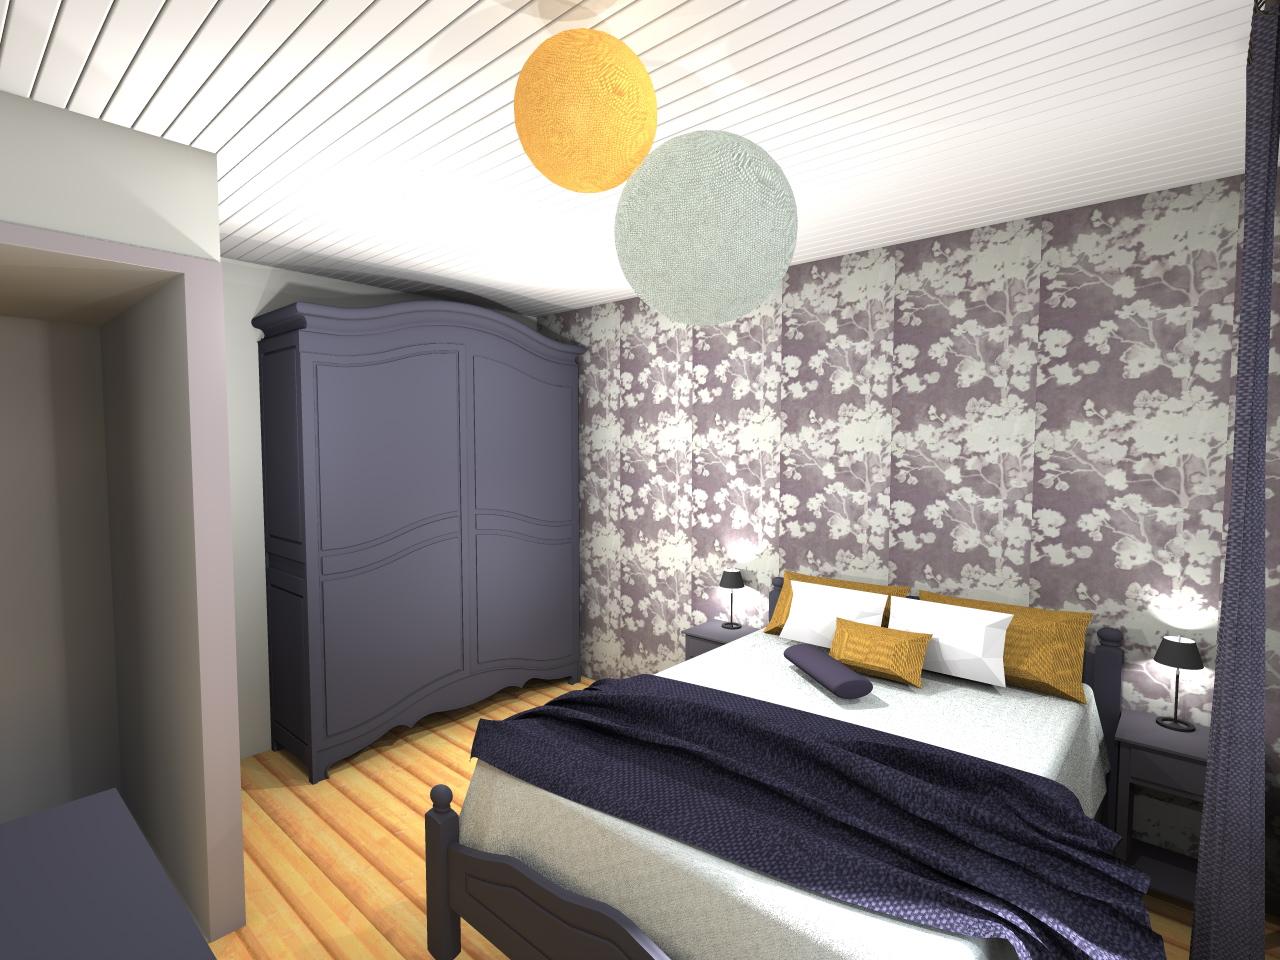 deco chambre adulte 2017. Black Bedroom Furniture Sets. Home Design Ideas